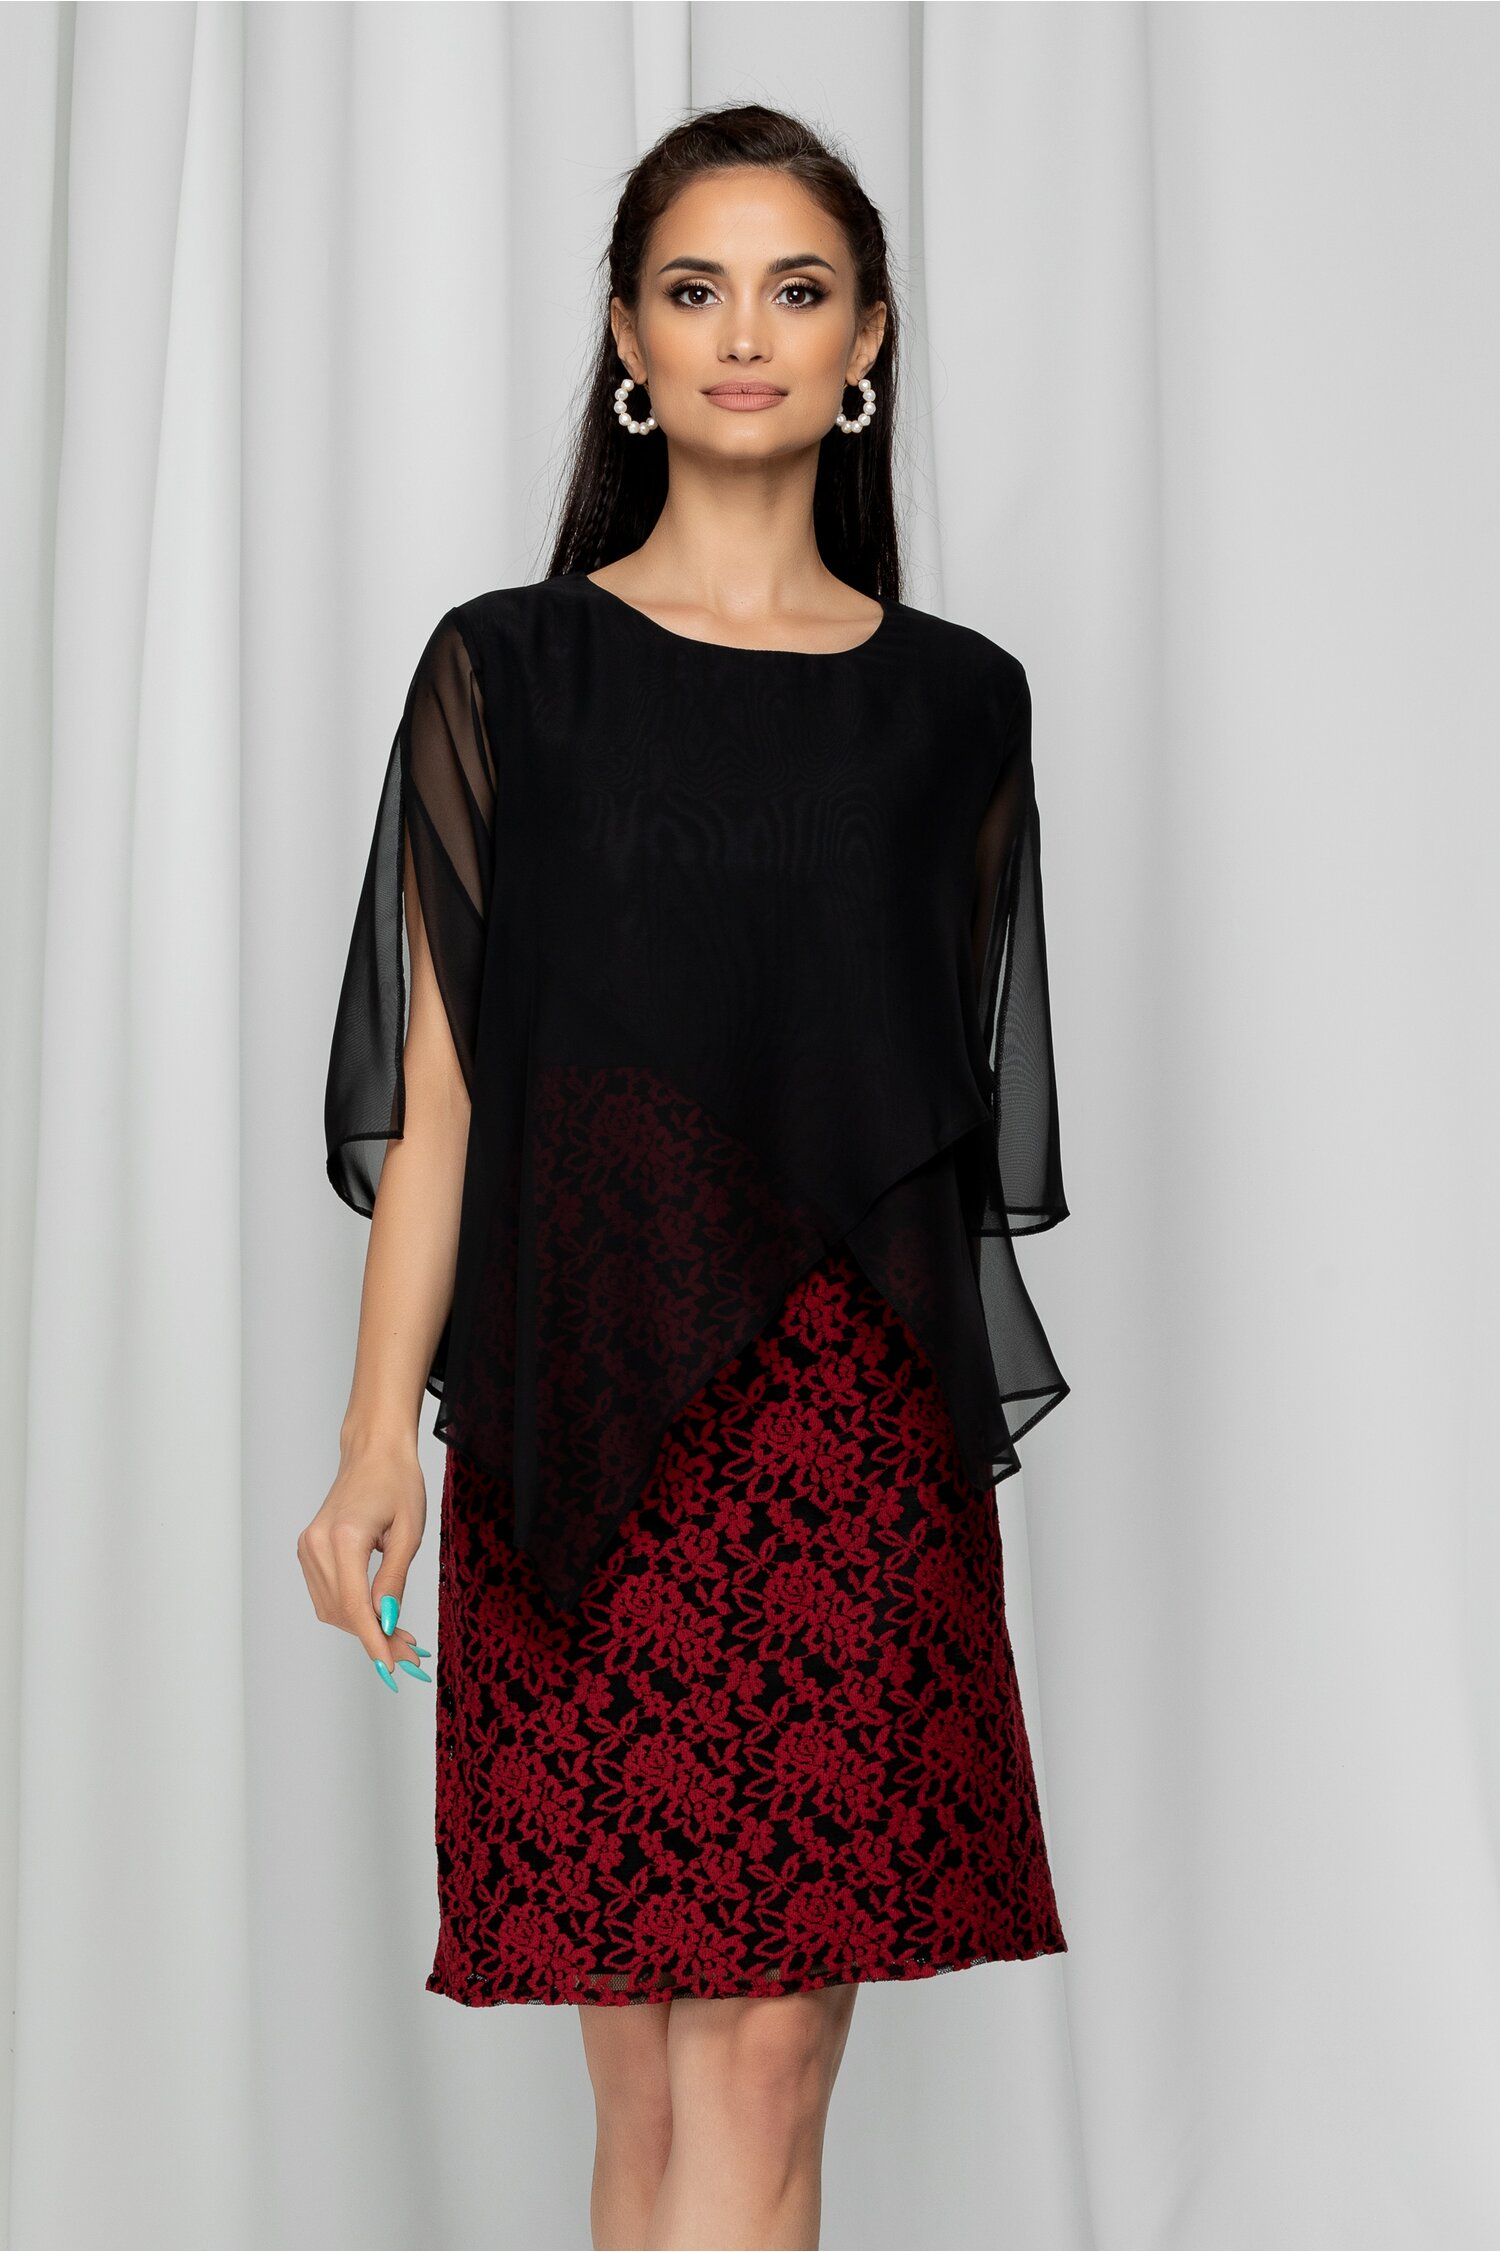 Rochie Valeria neagra vaporoasa cu dantela rosie